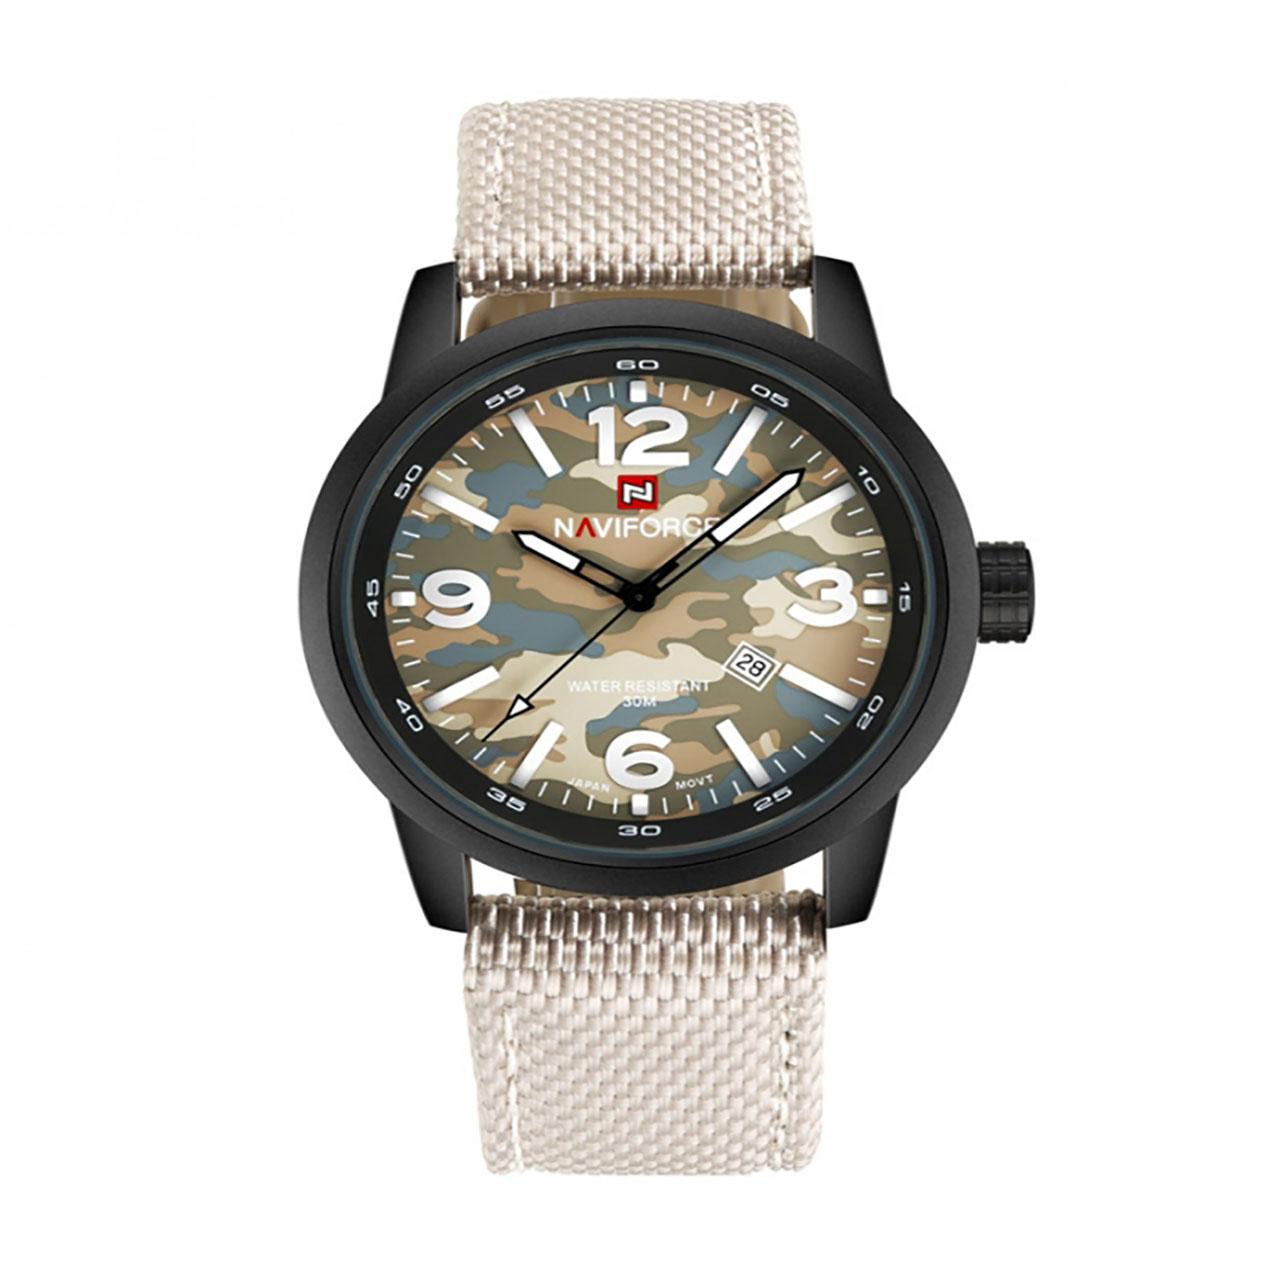 ساعت مچی نیوی فورس مردانه مدل nf9080 36